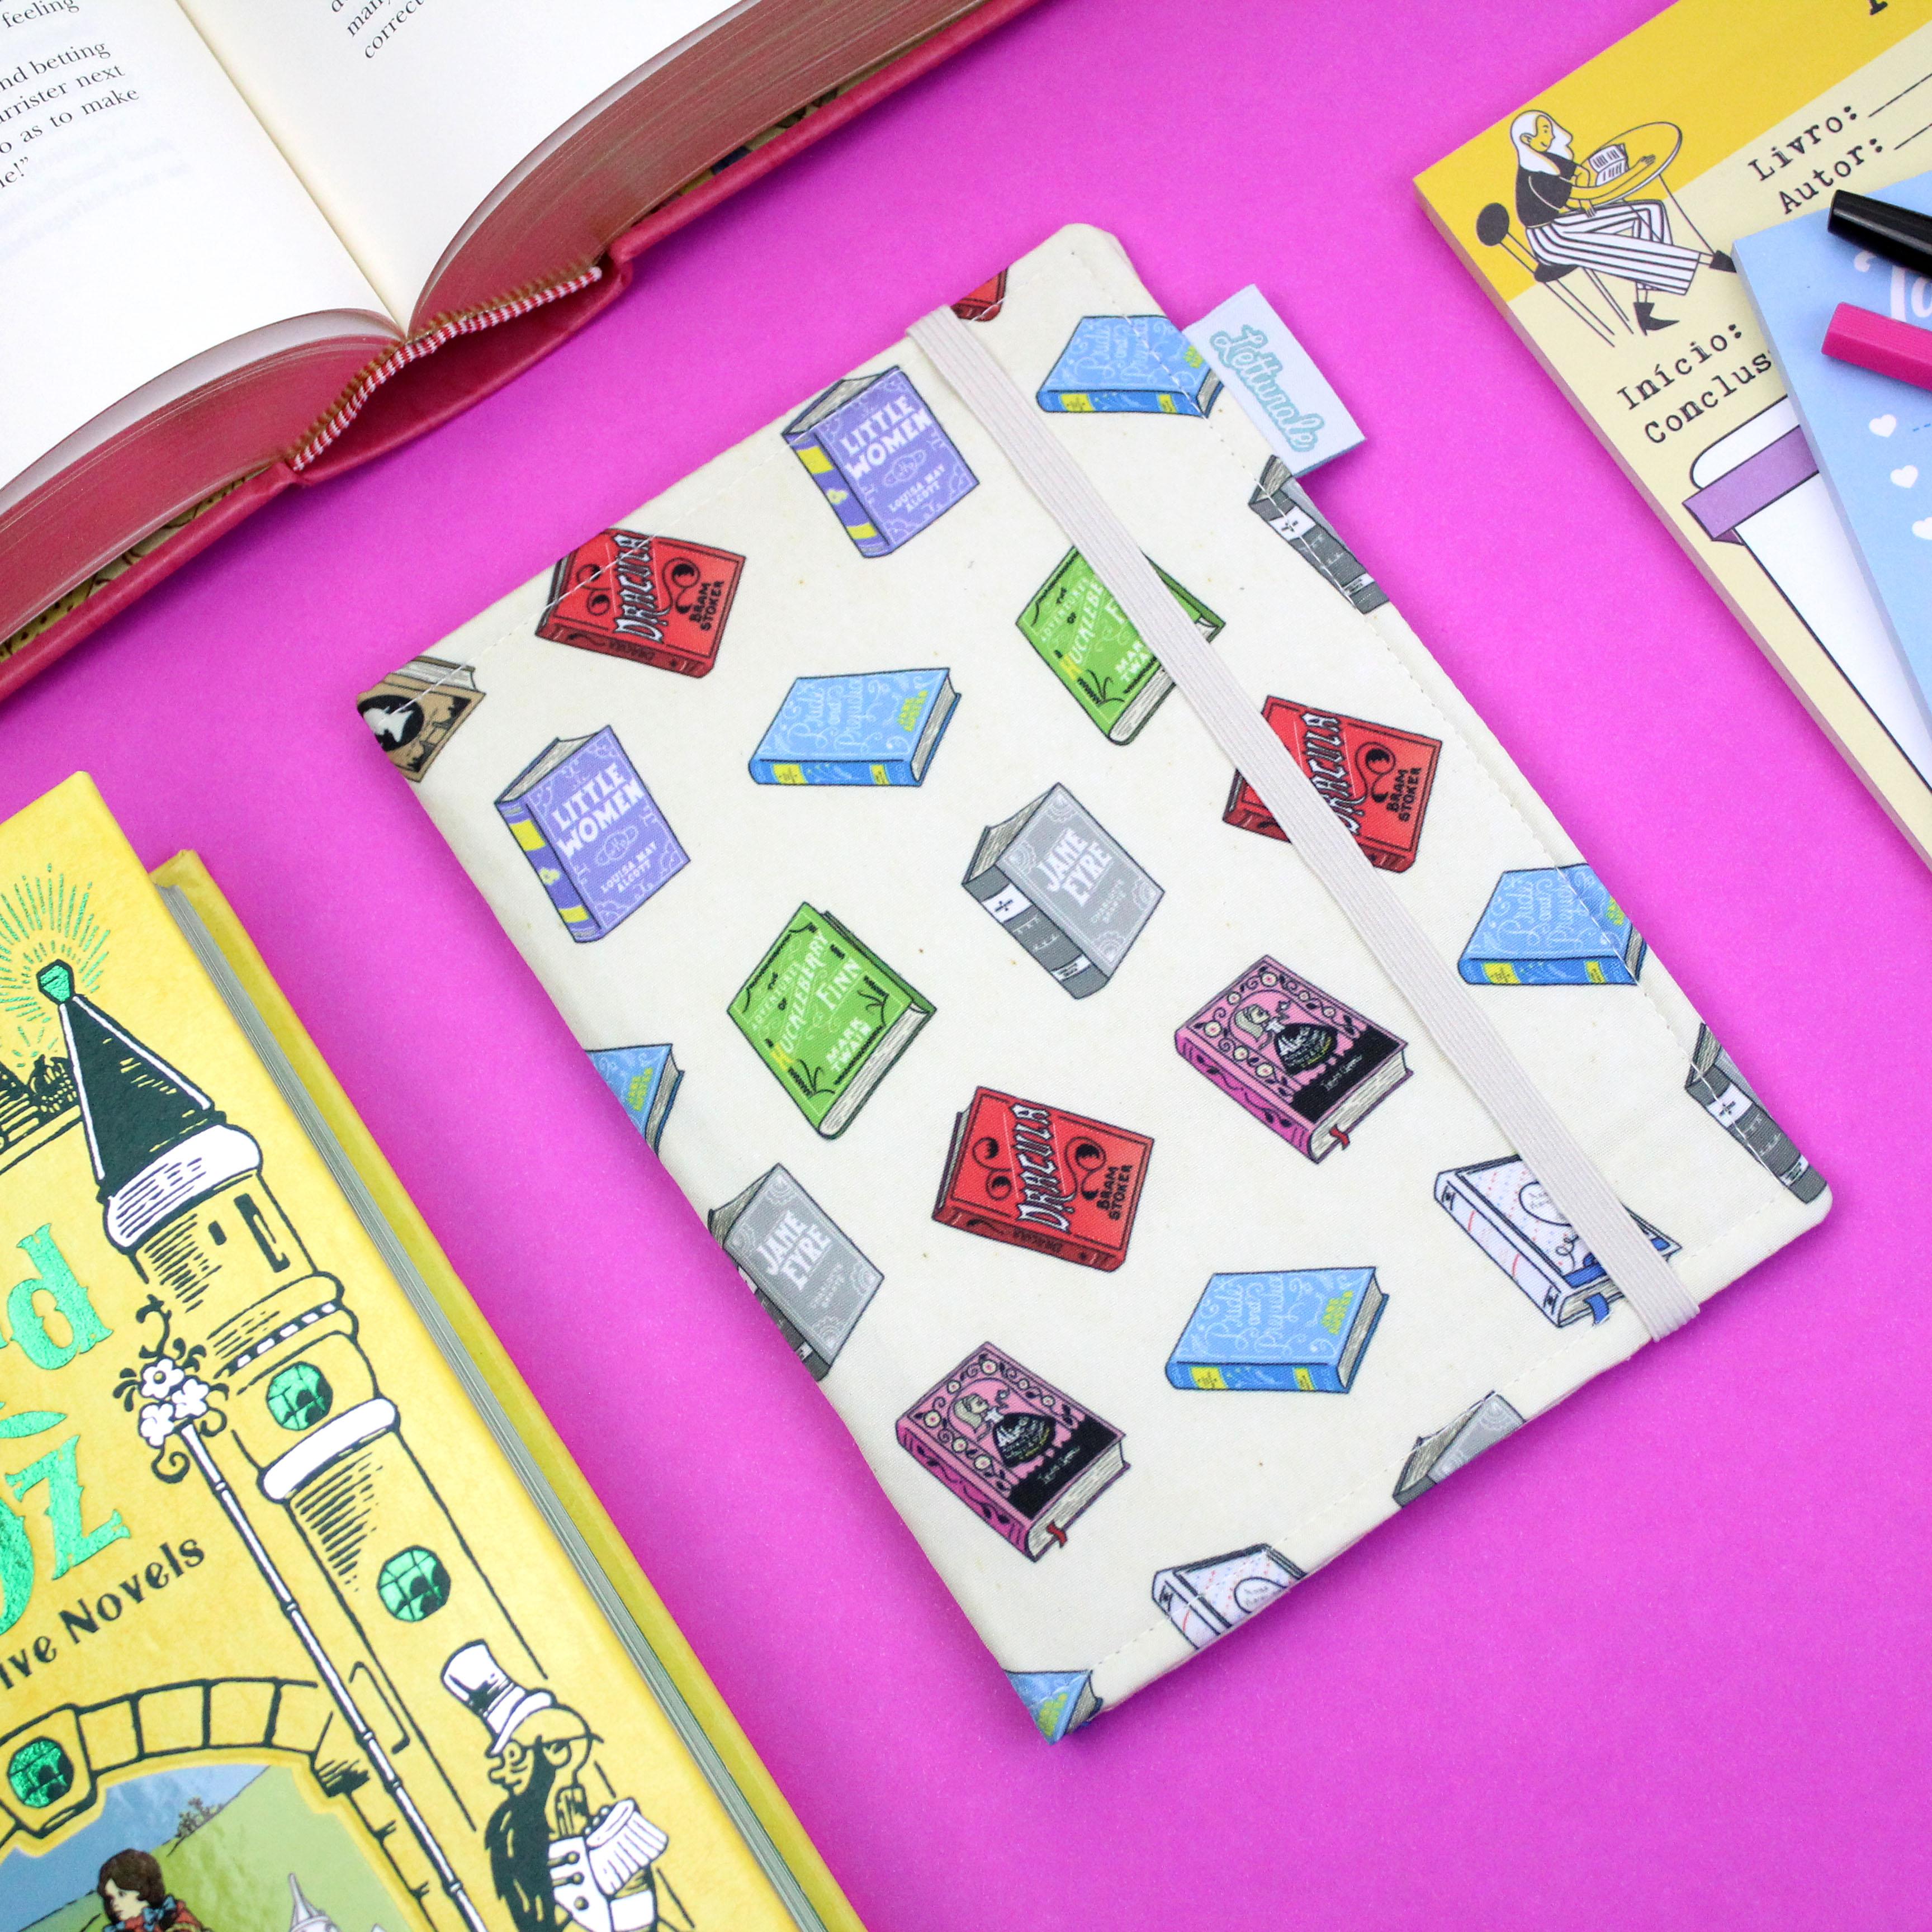 Capa para Kindle PaperWhite Clássicos Estrangeiros